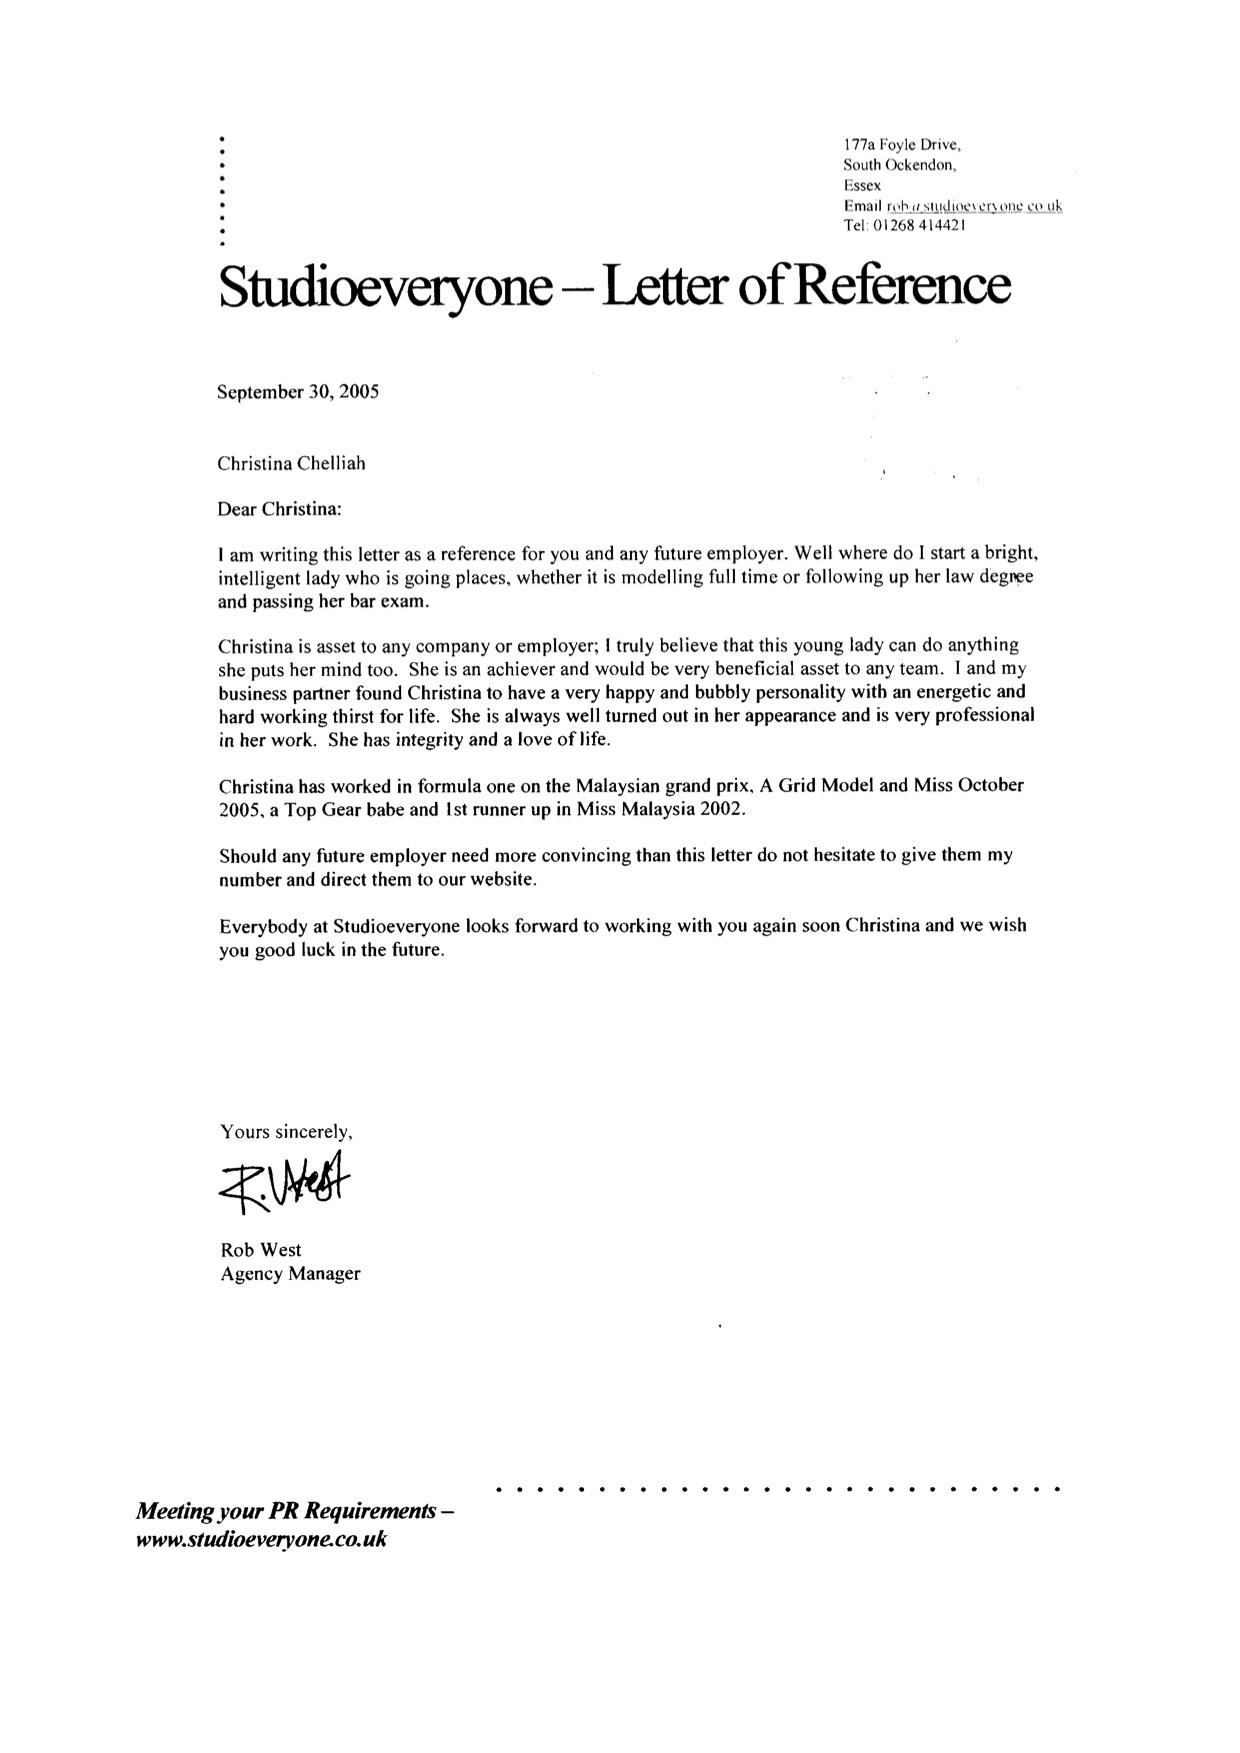 2005 - Modeling - Studio Everyone Agency - Reference Letter.jpg